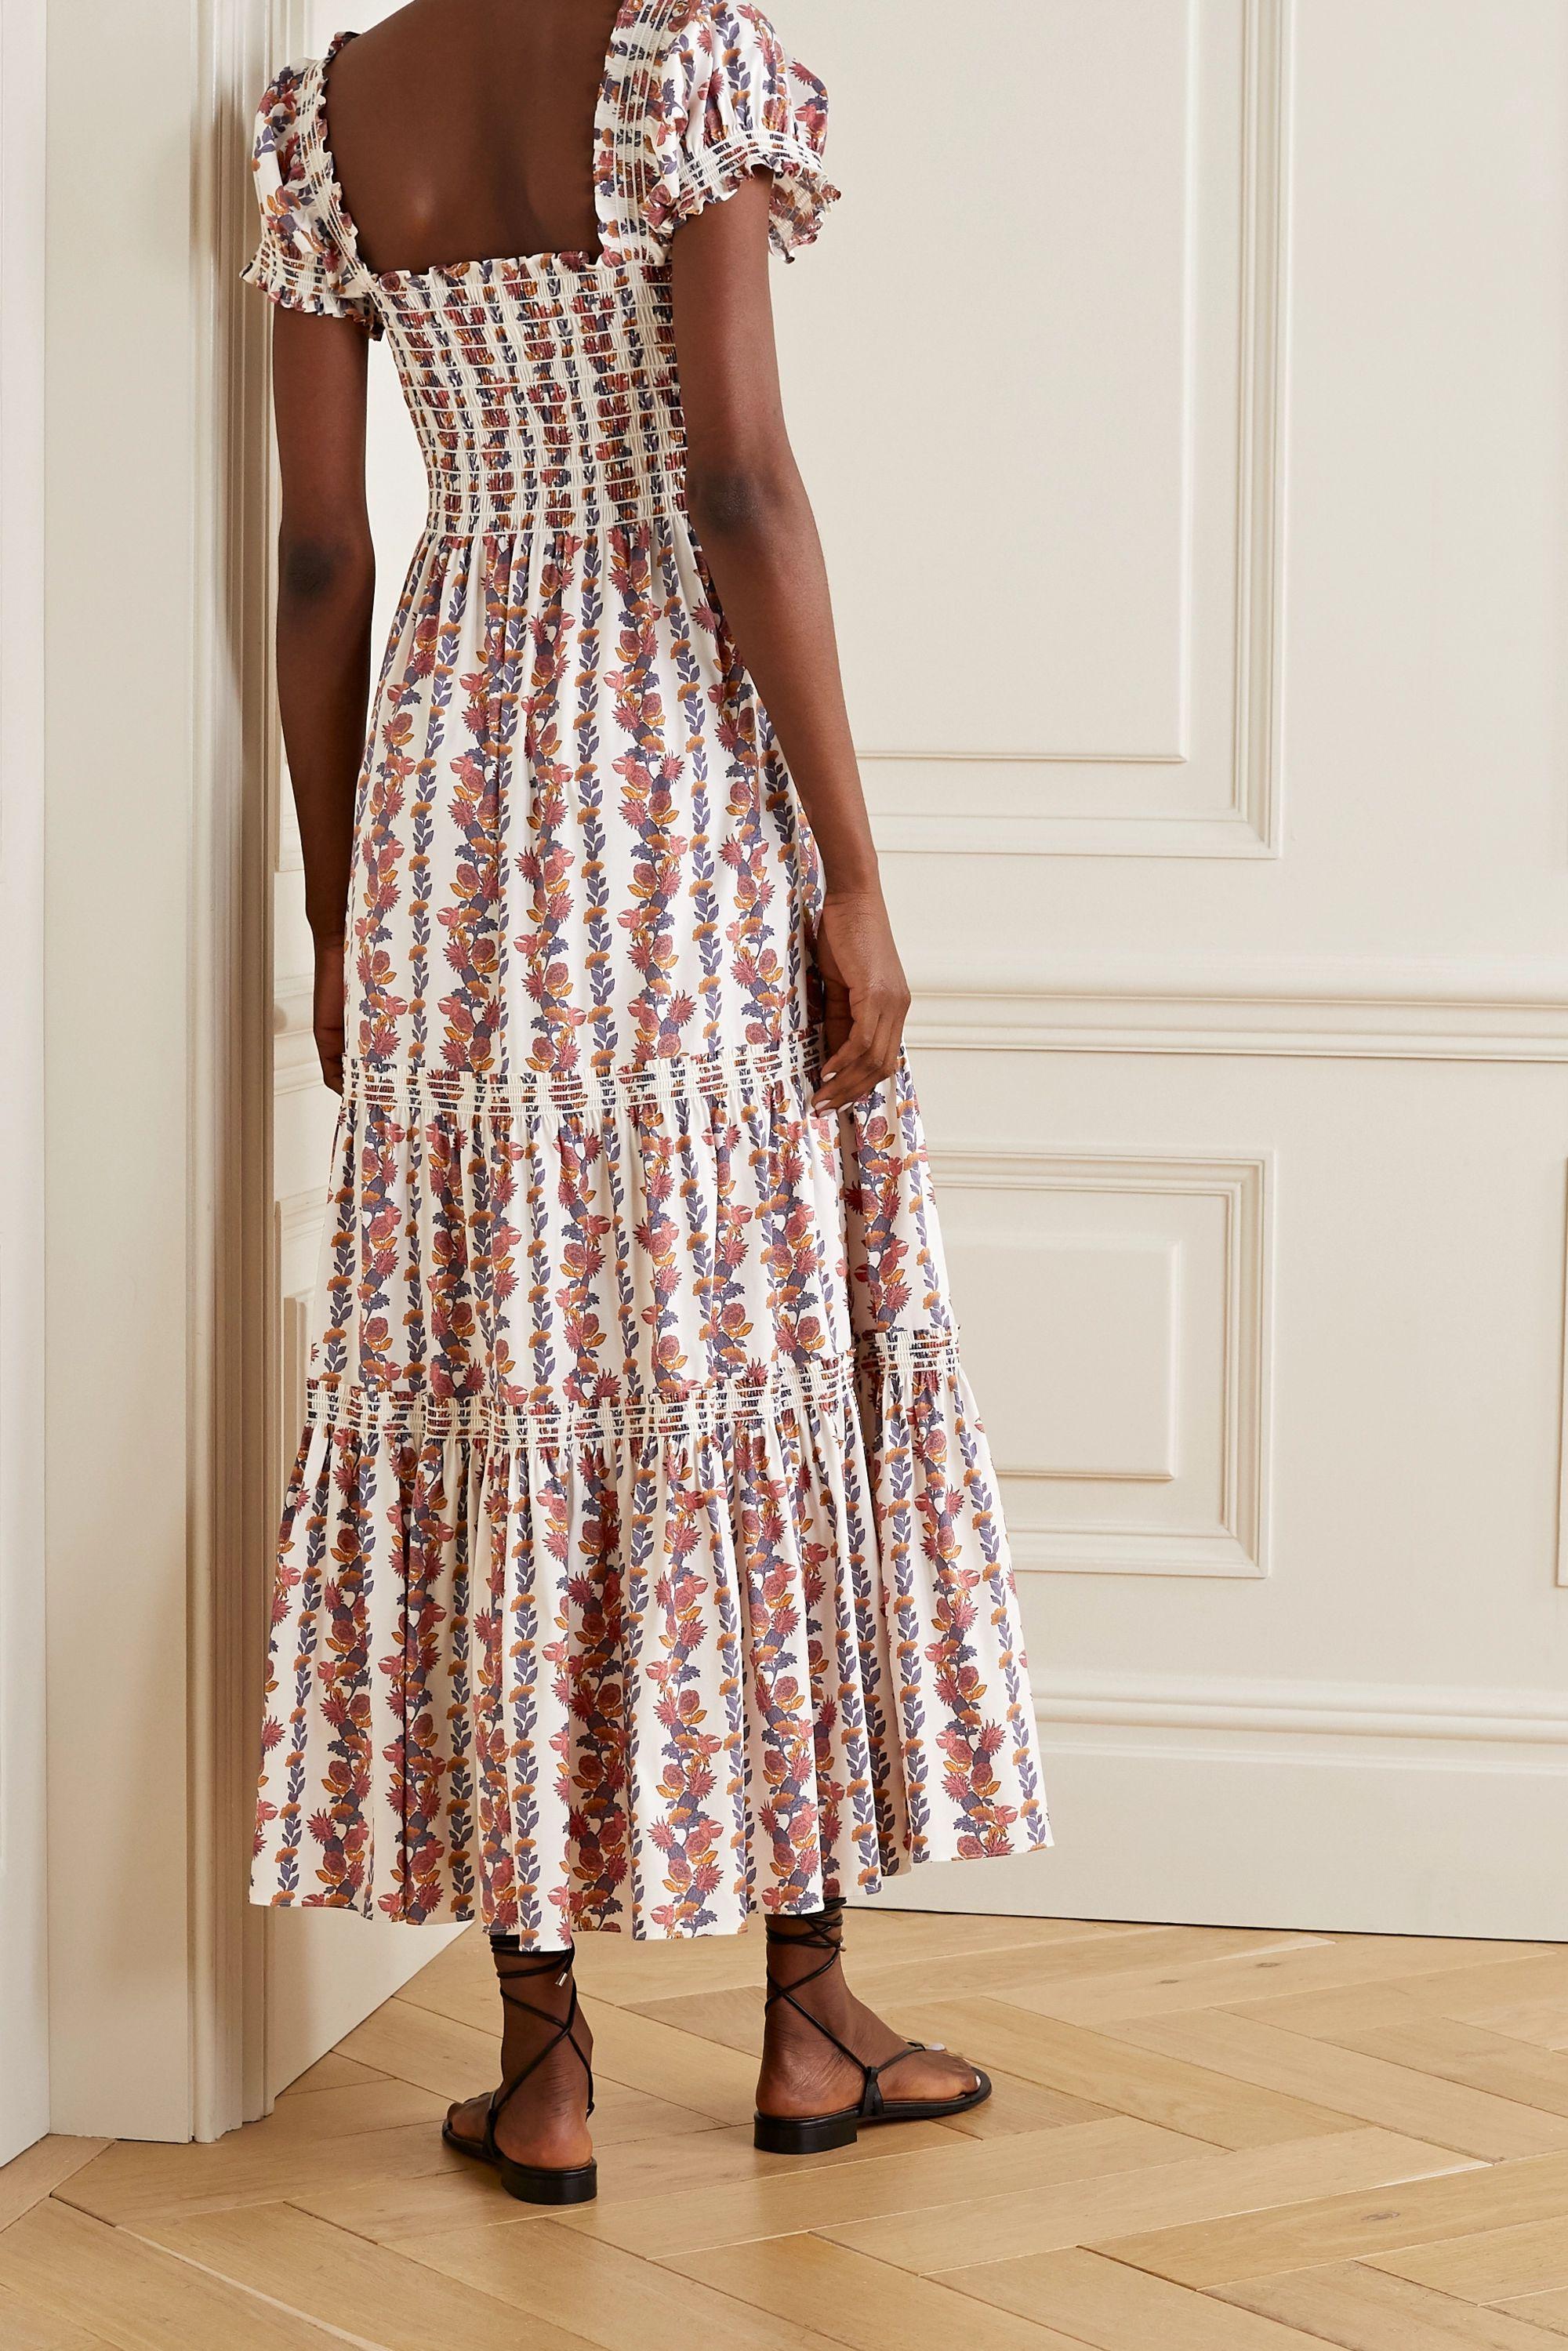 Tory Burch Smocked floral-print cotton-blend midi dress